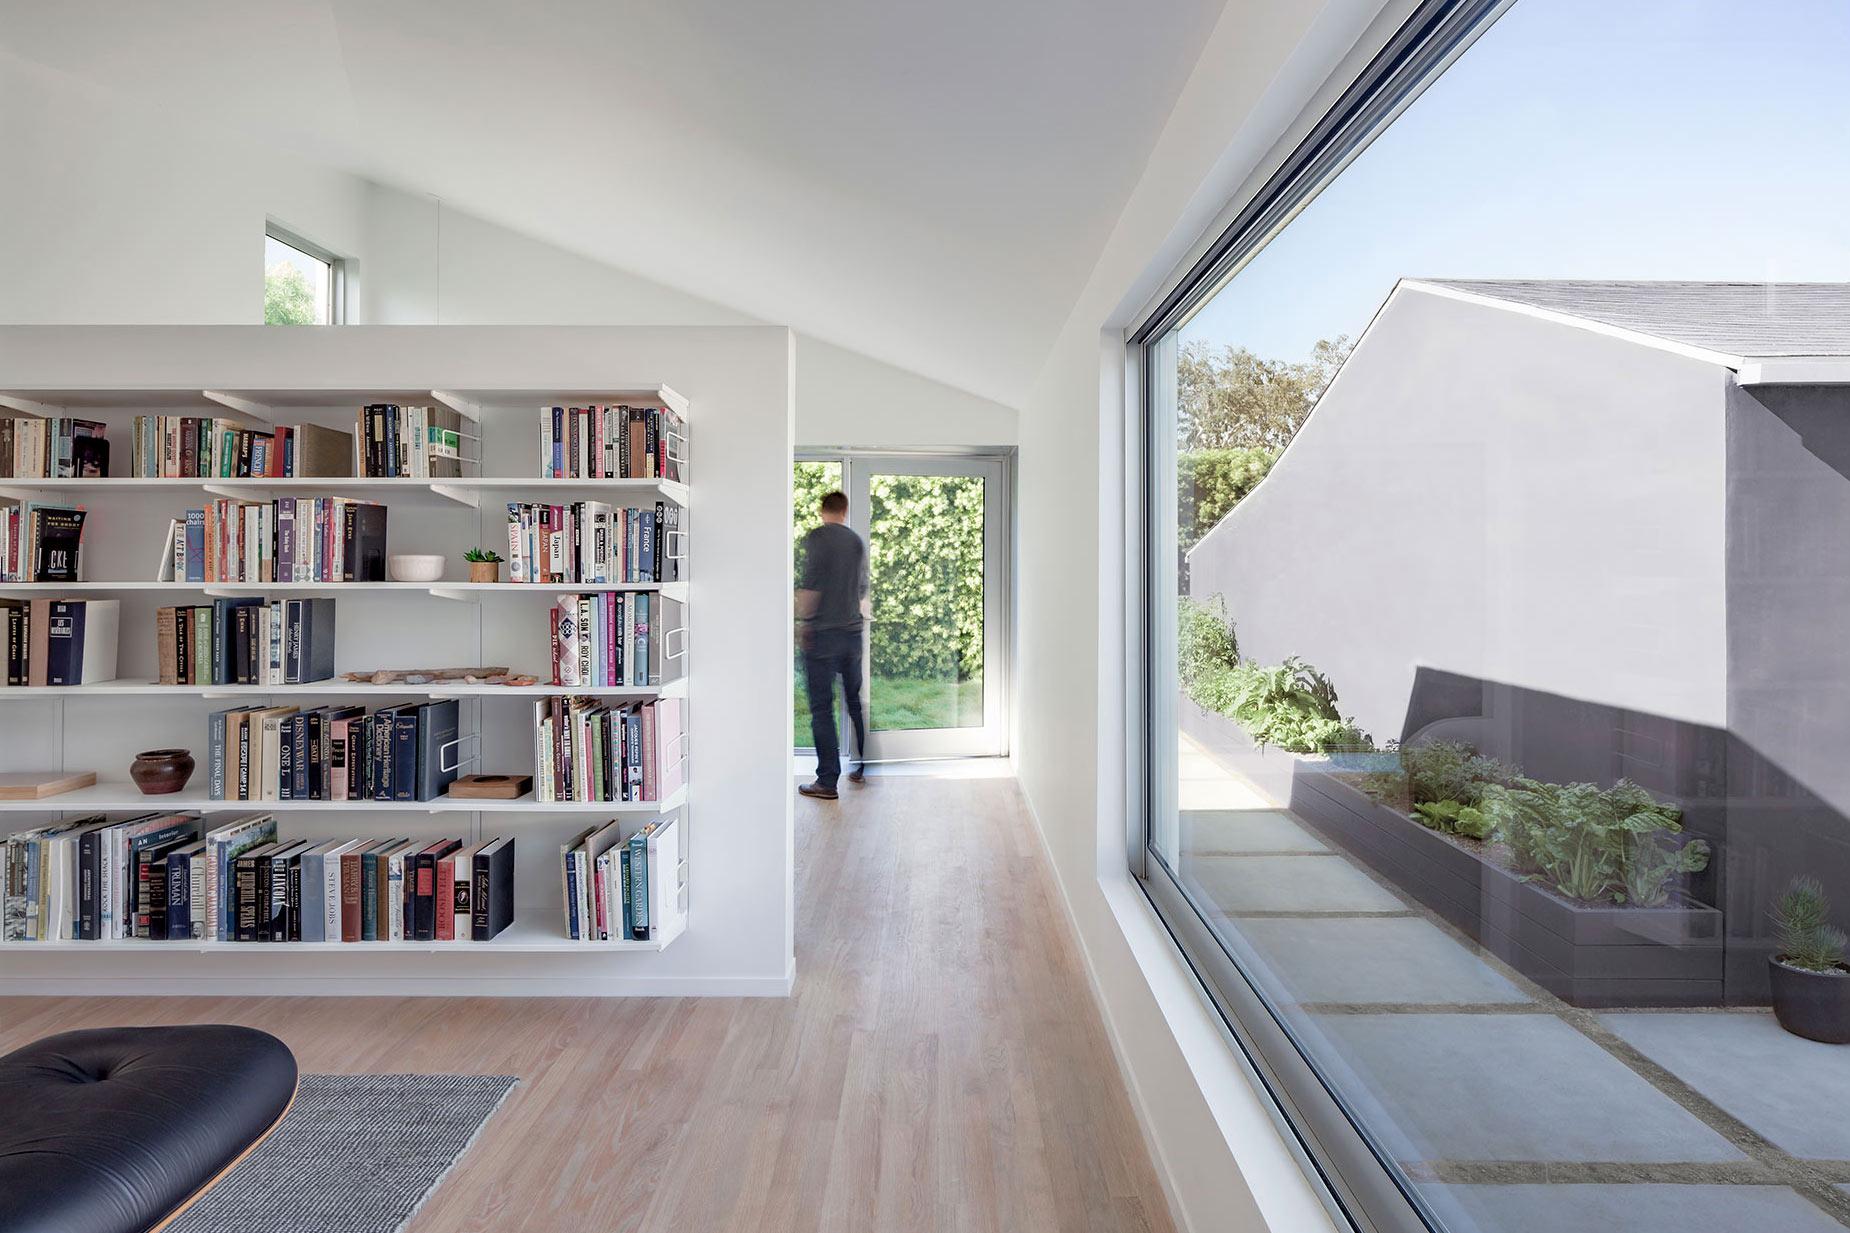 Interior-library-wide.jpg